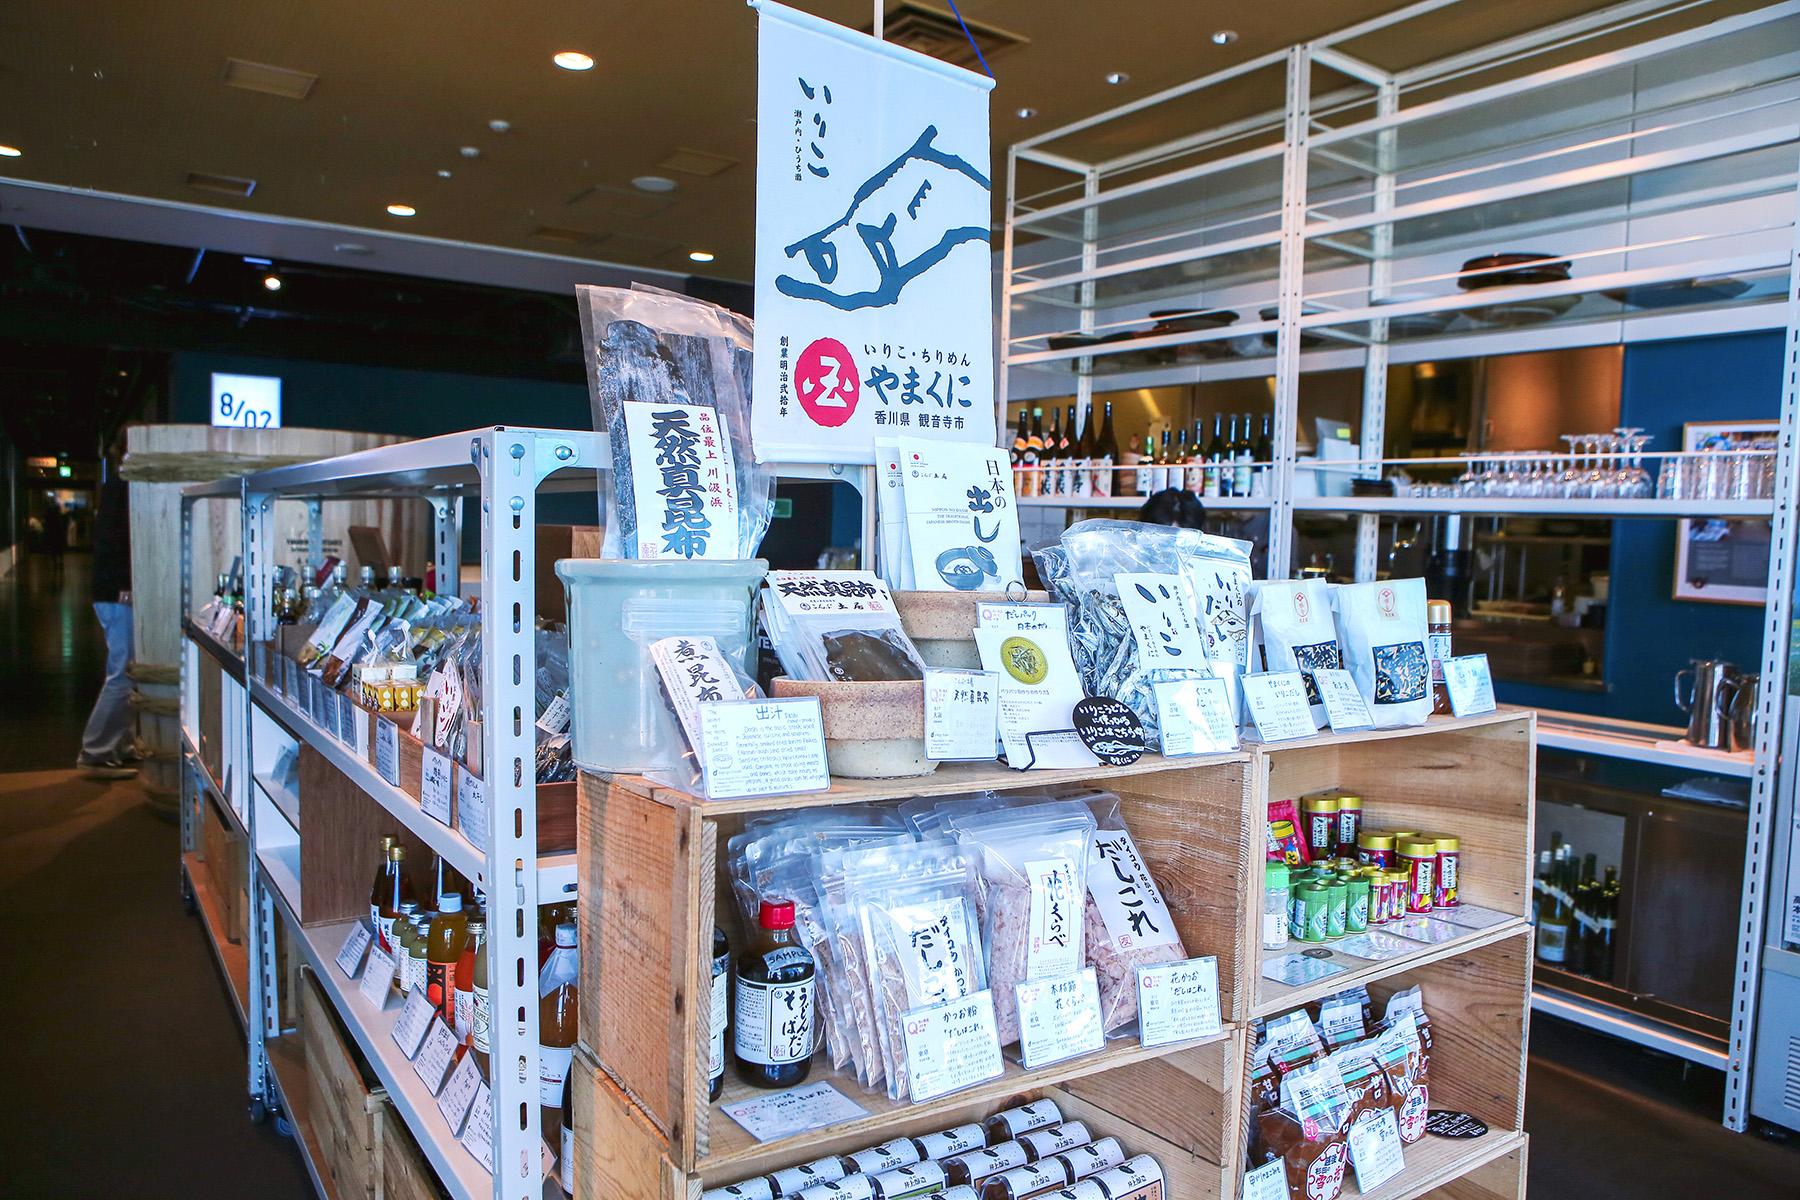 d47食堂中可購買由D&DEPARTMENT挑選,具有設計且代表地方文化的食材、調味料等產品。